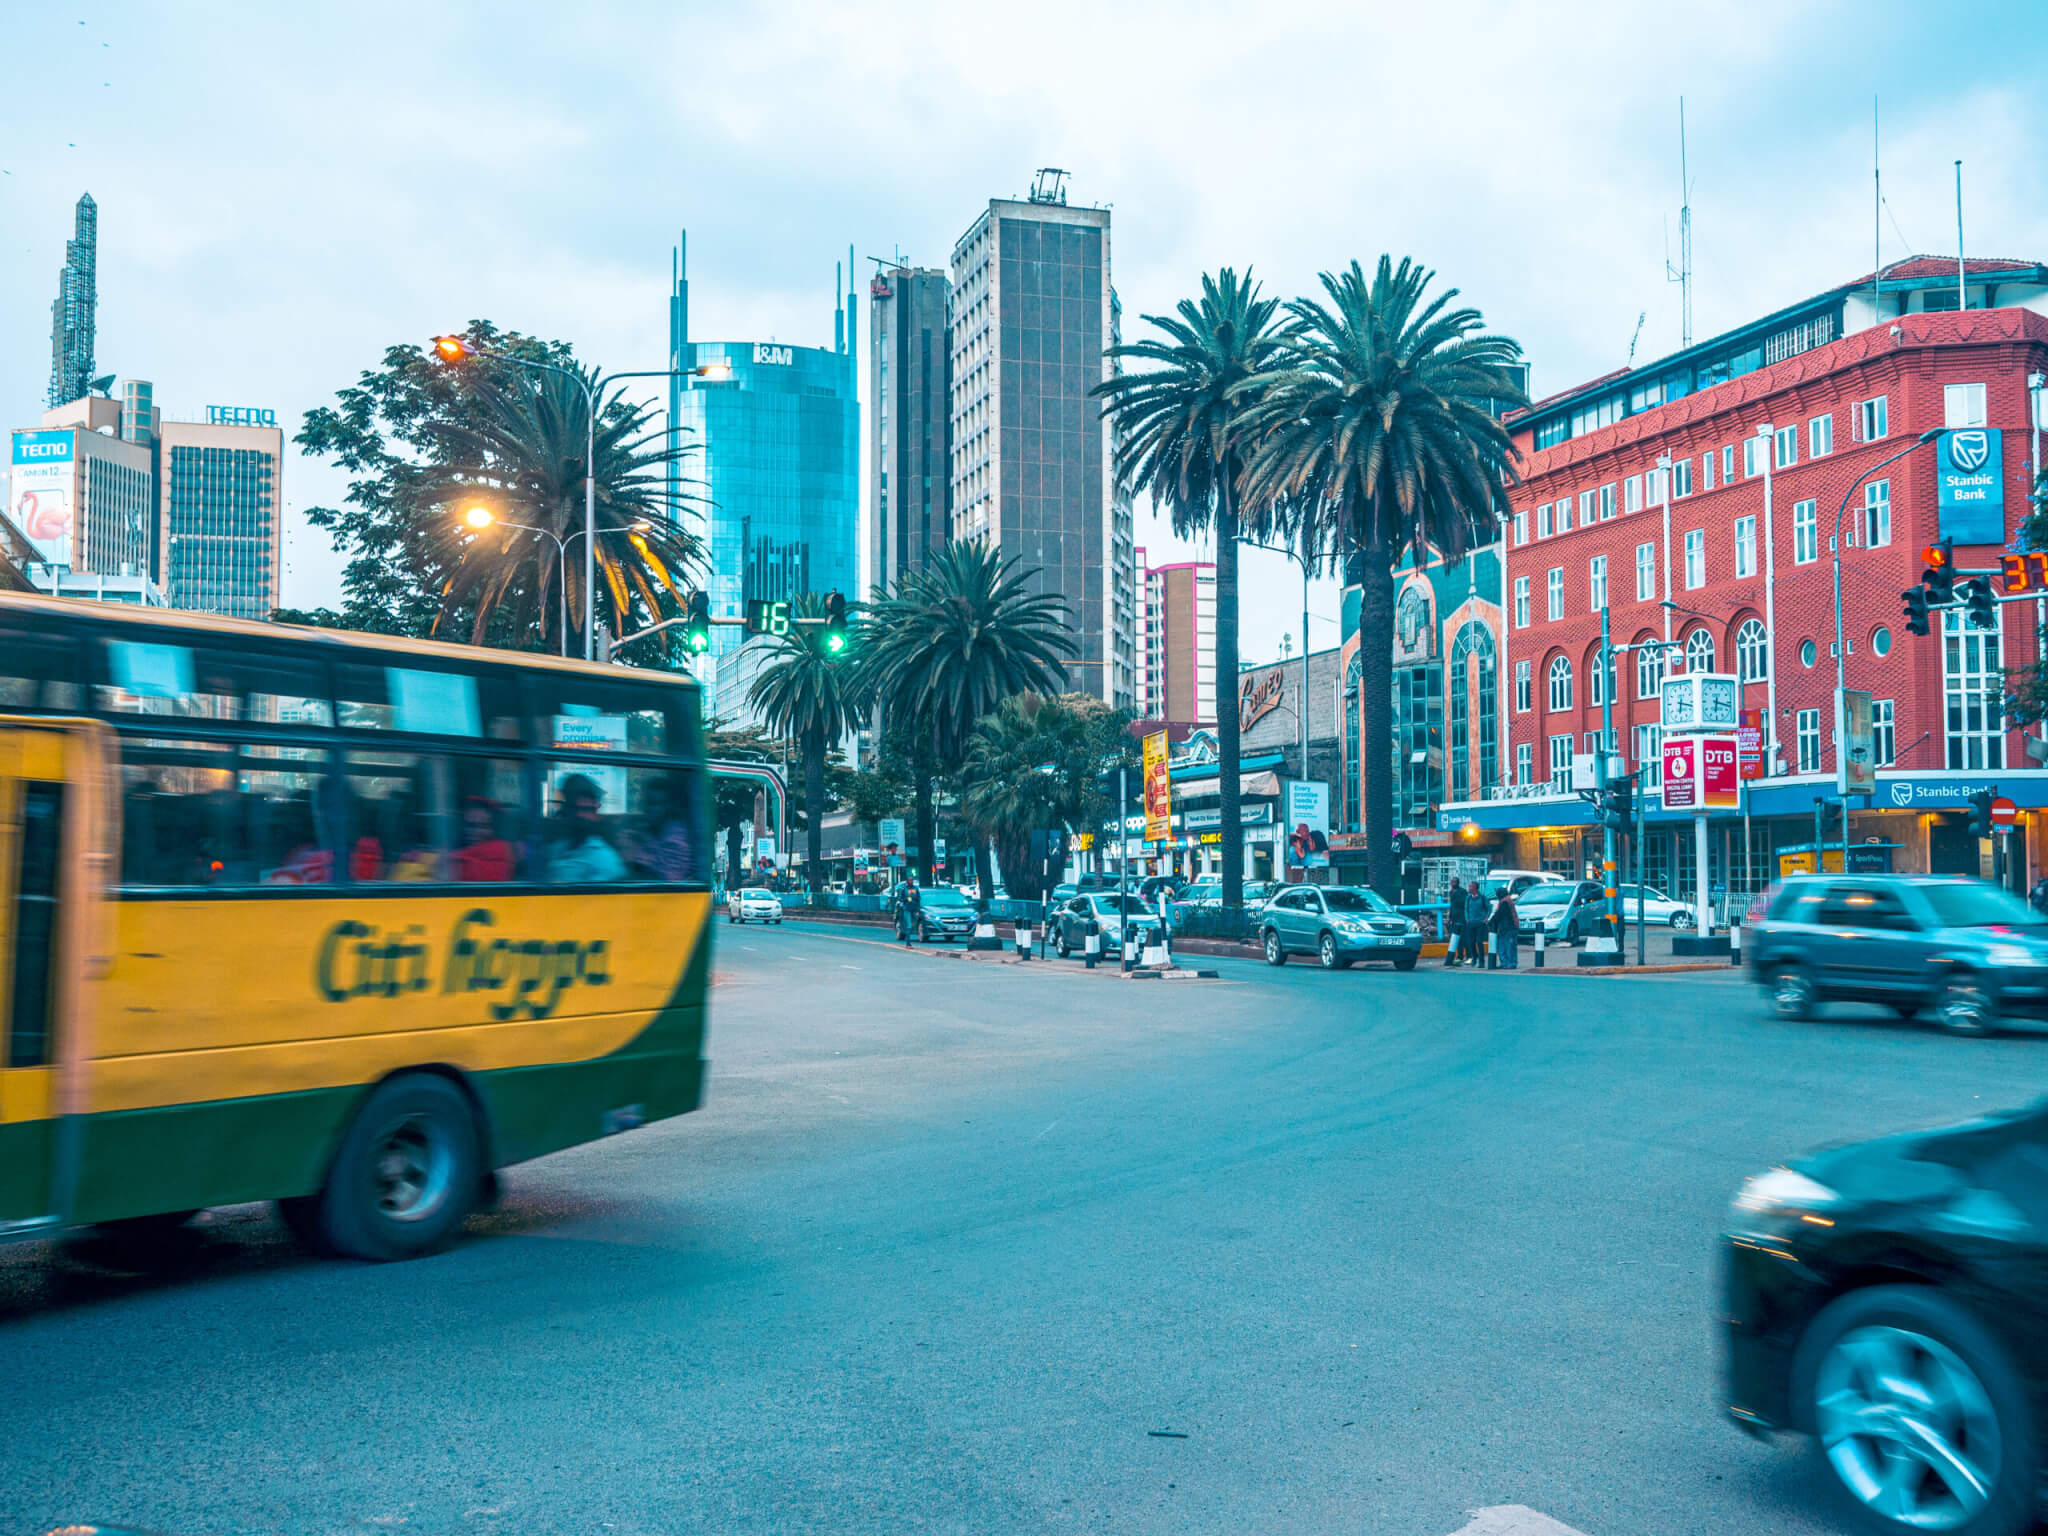 Nairobi liikenne